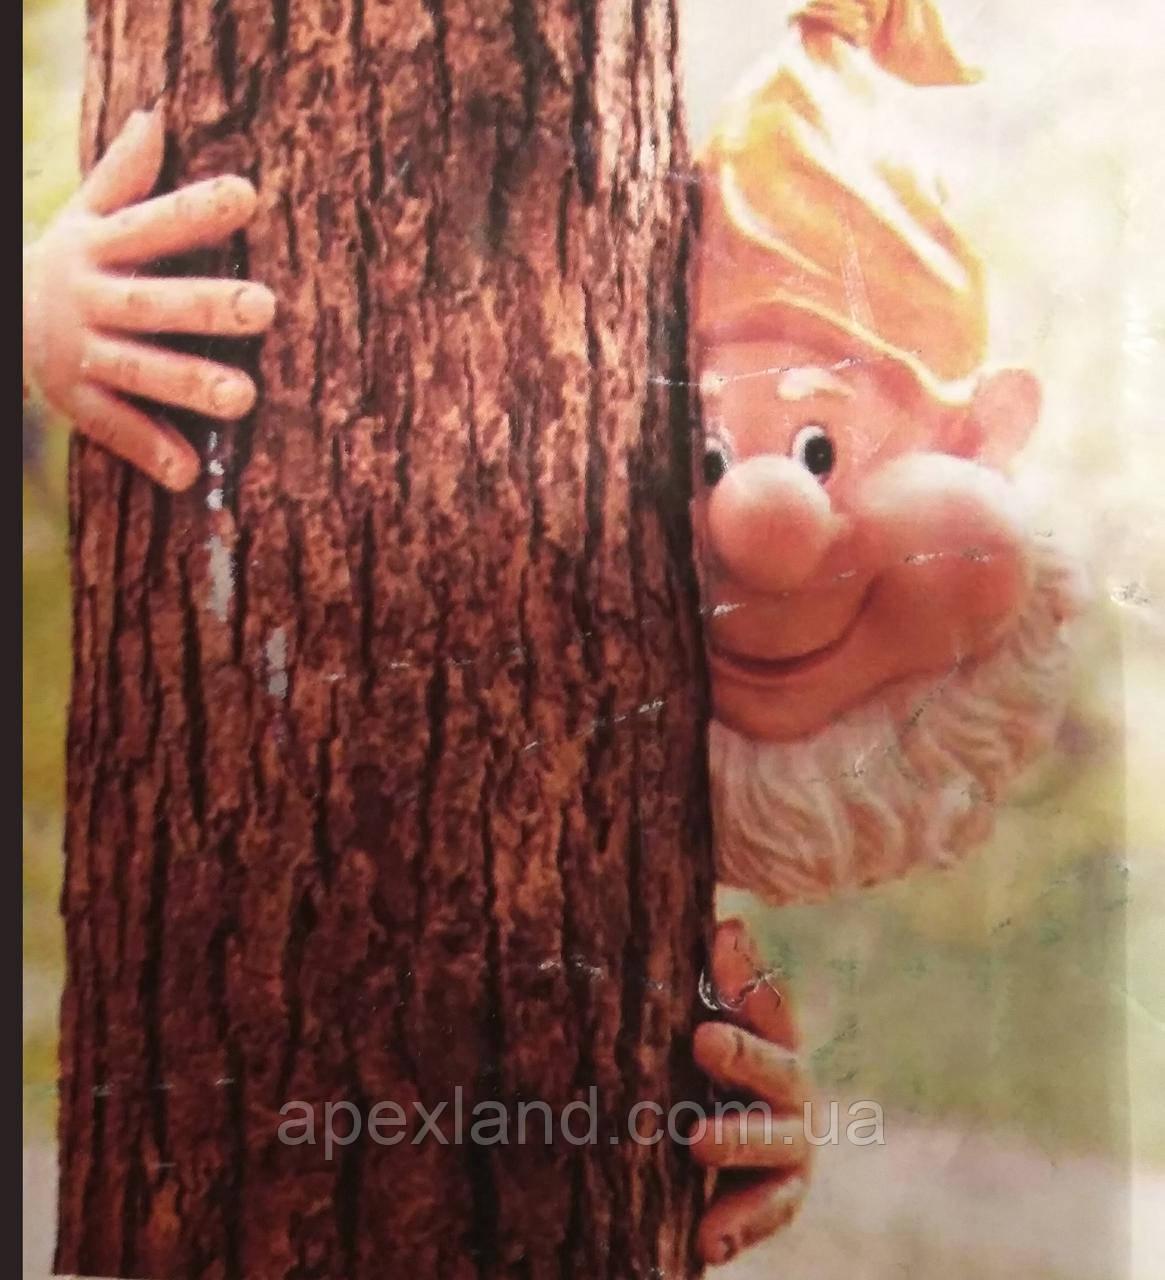 Декор для  ствола дерева - гном на дереве